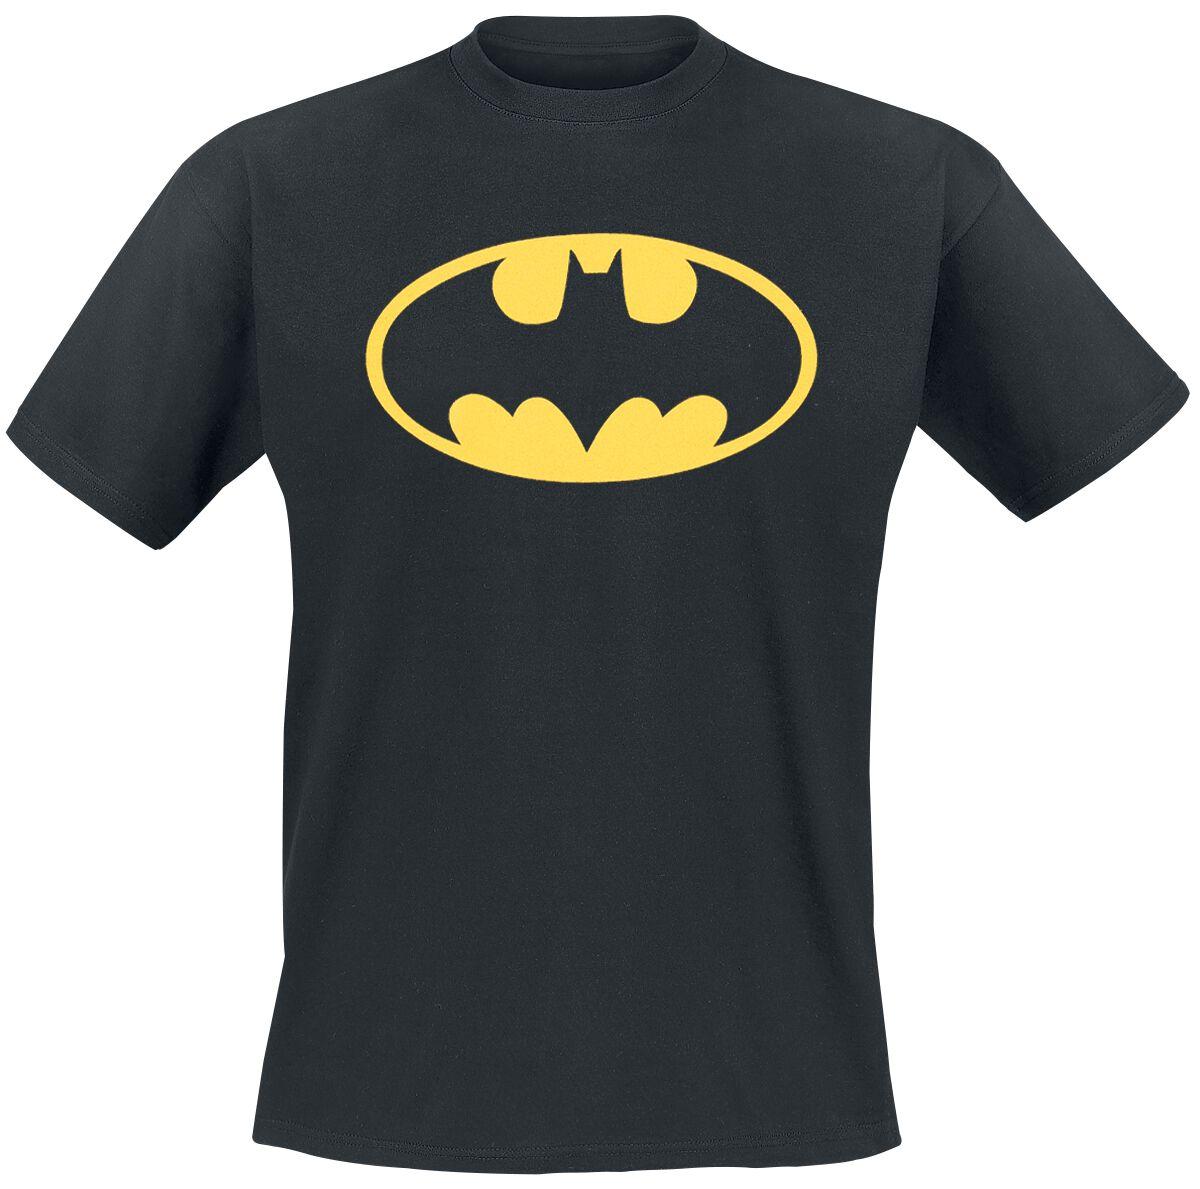 Image of   Batman Logo T-Shirt sort